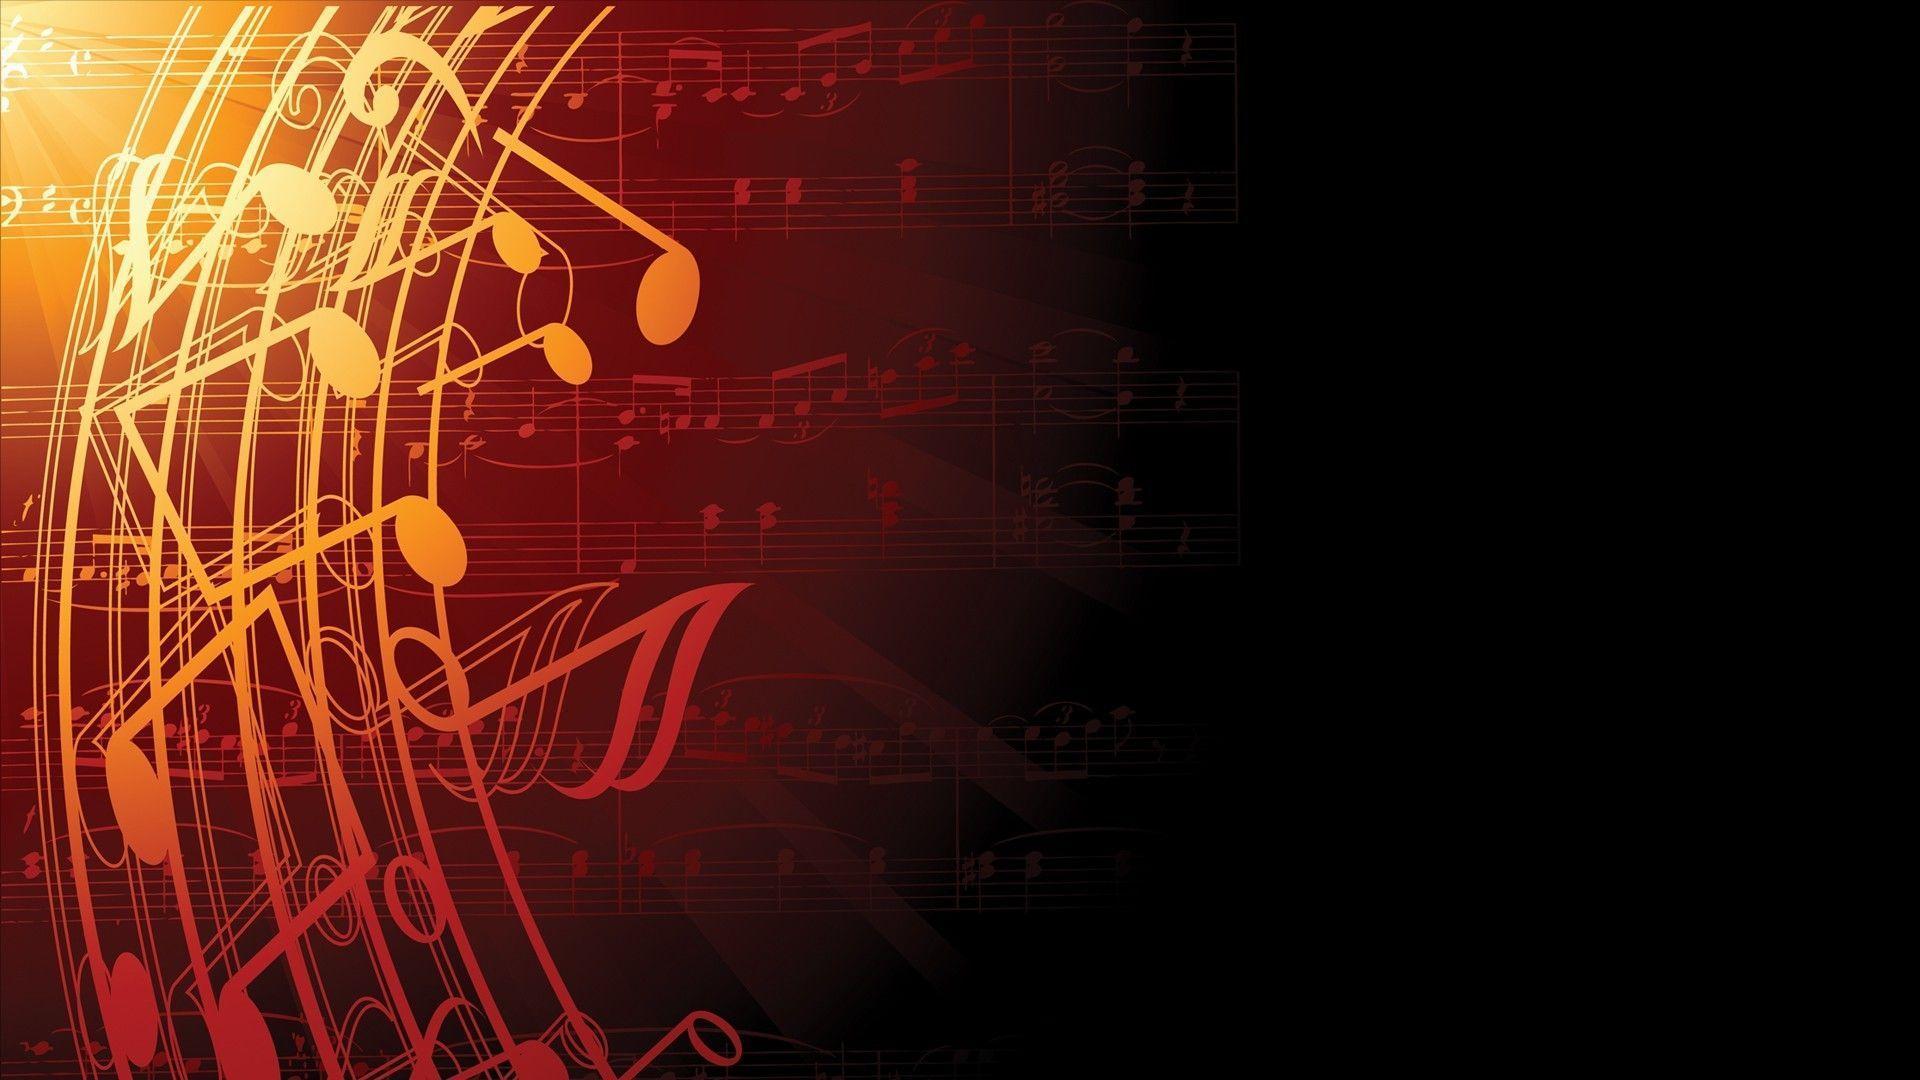 classic music wallpaper - photo #17